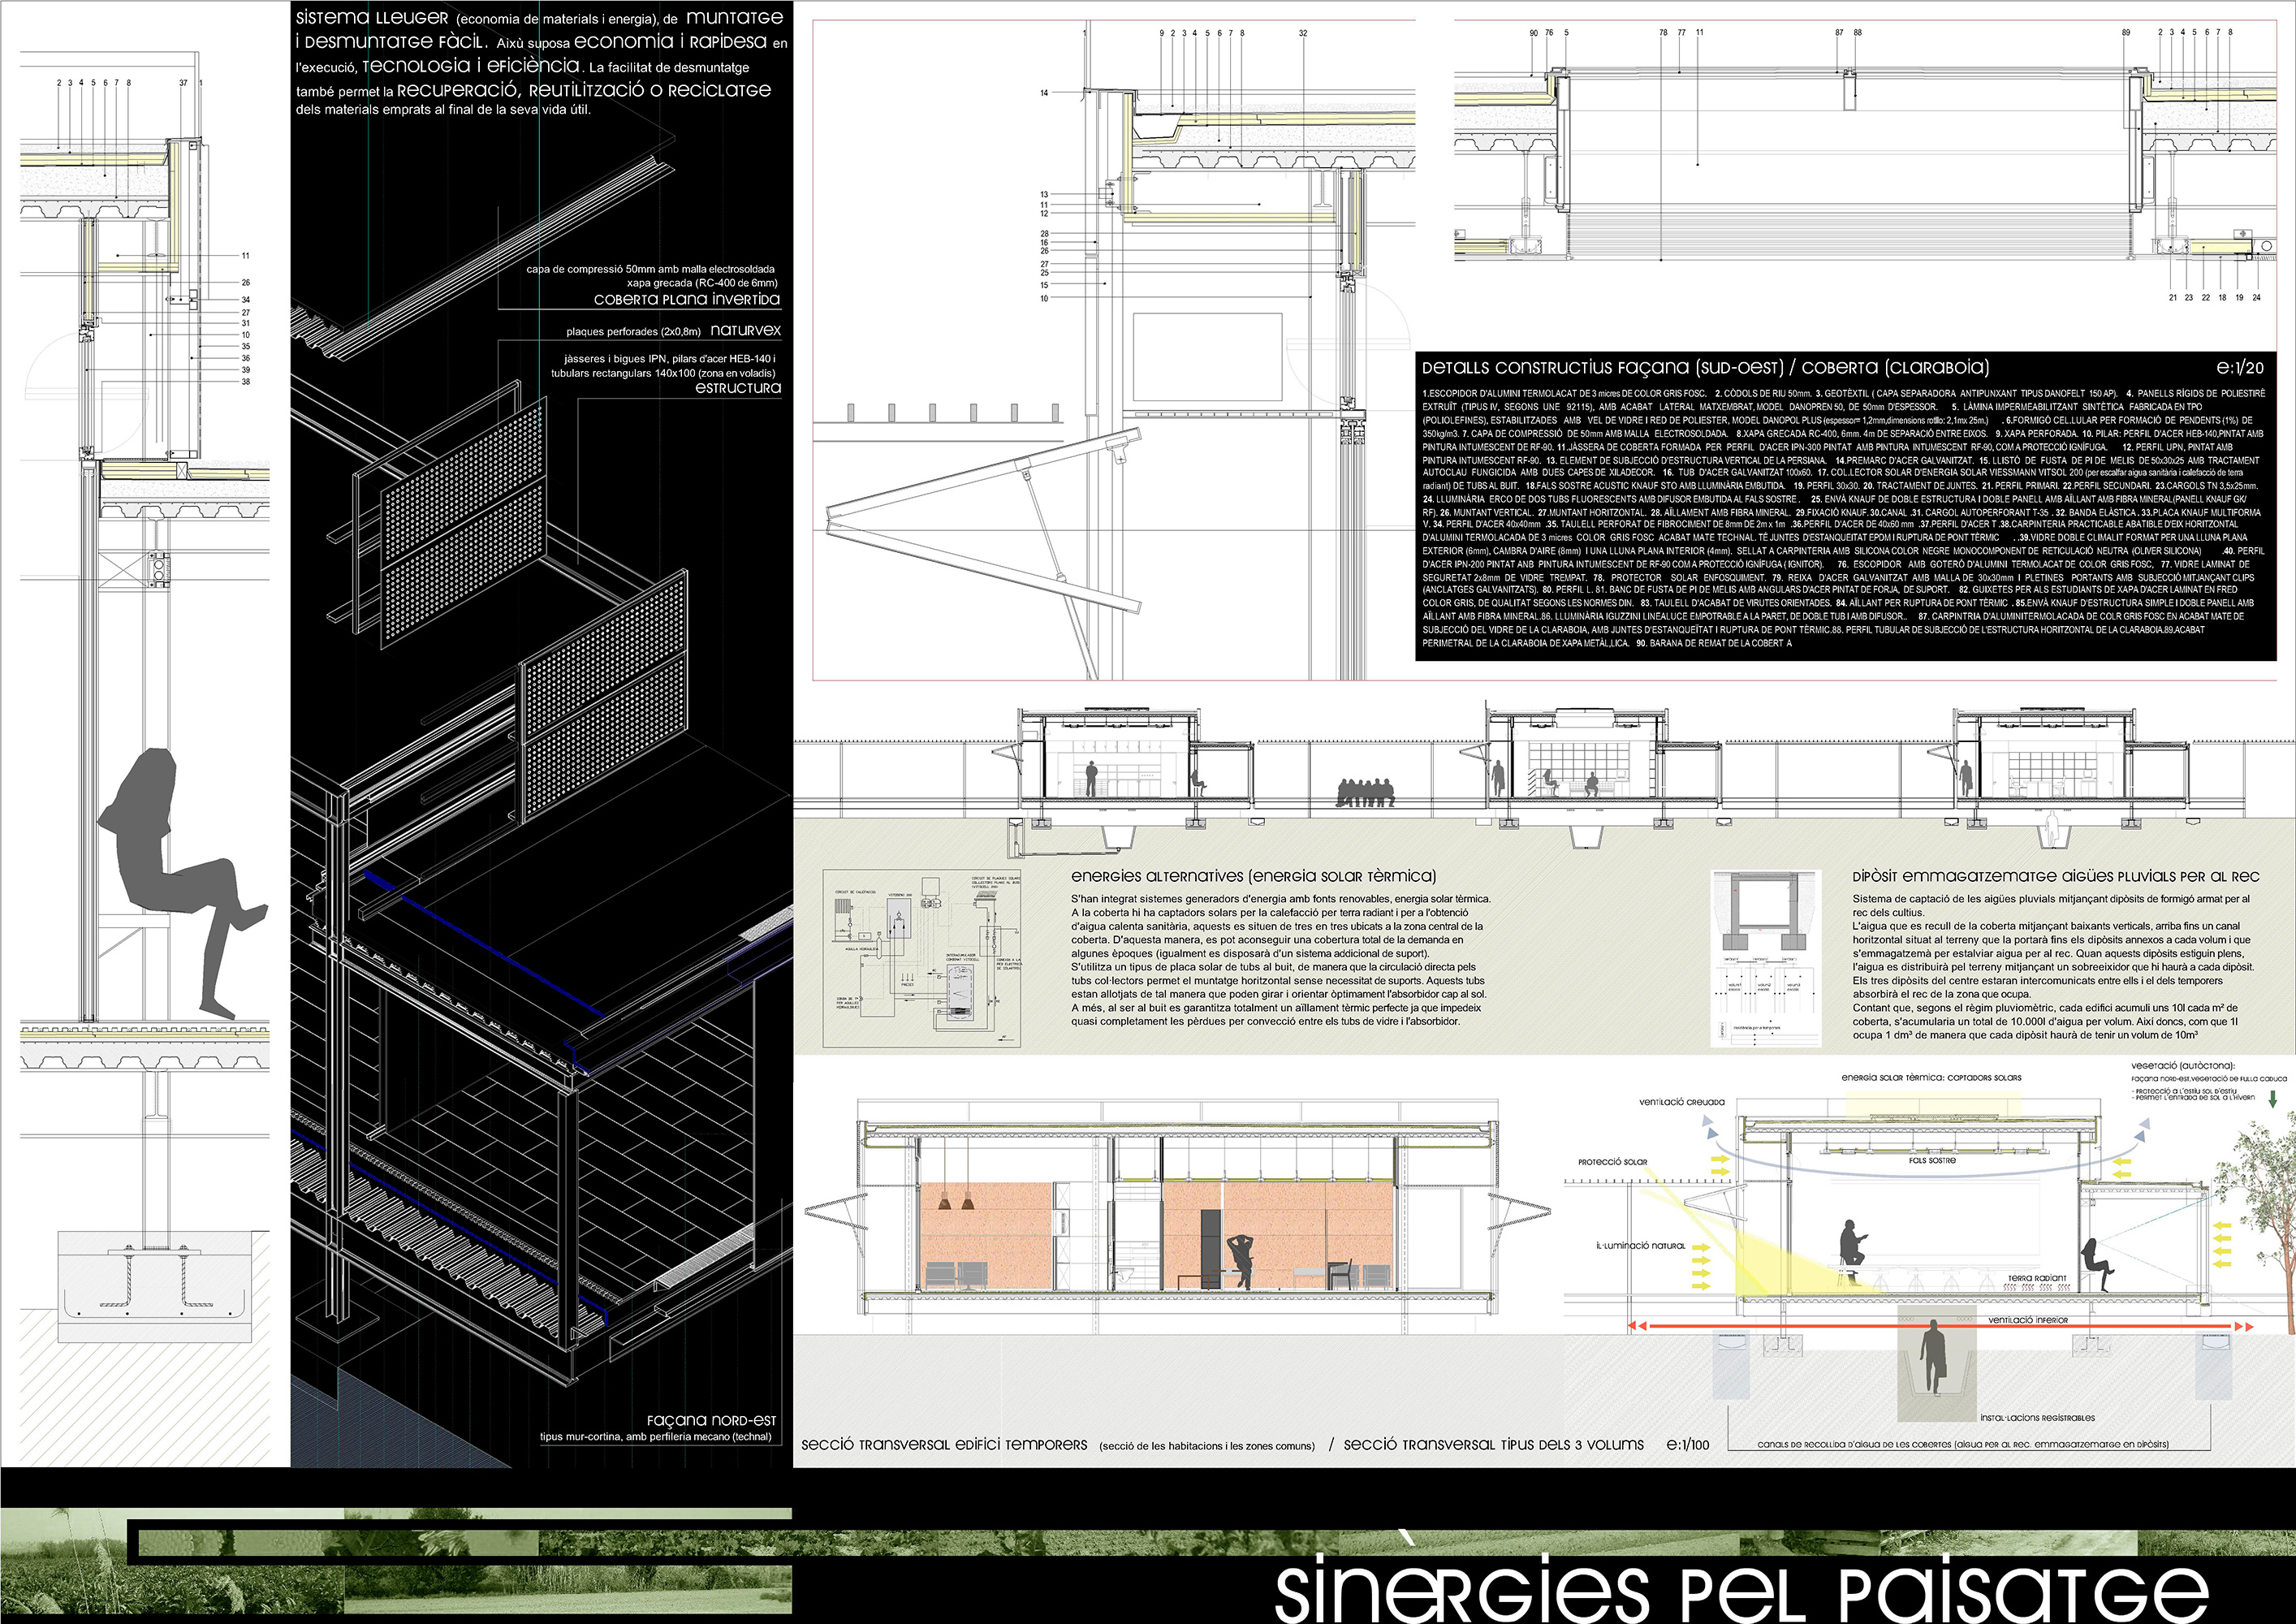 http://www.oa-arquitectes.com/wp-content/uploads/2018/05/03-2.jpg